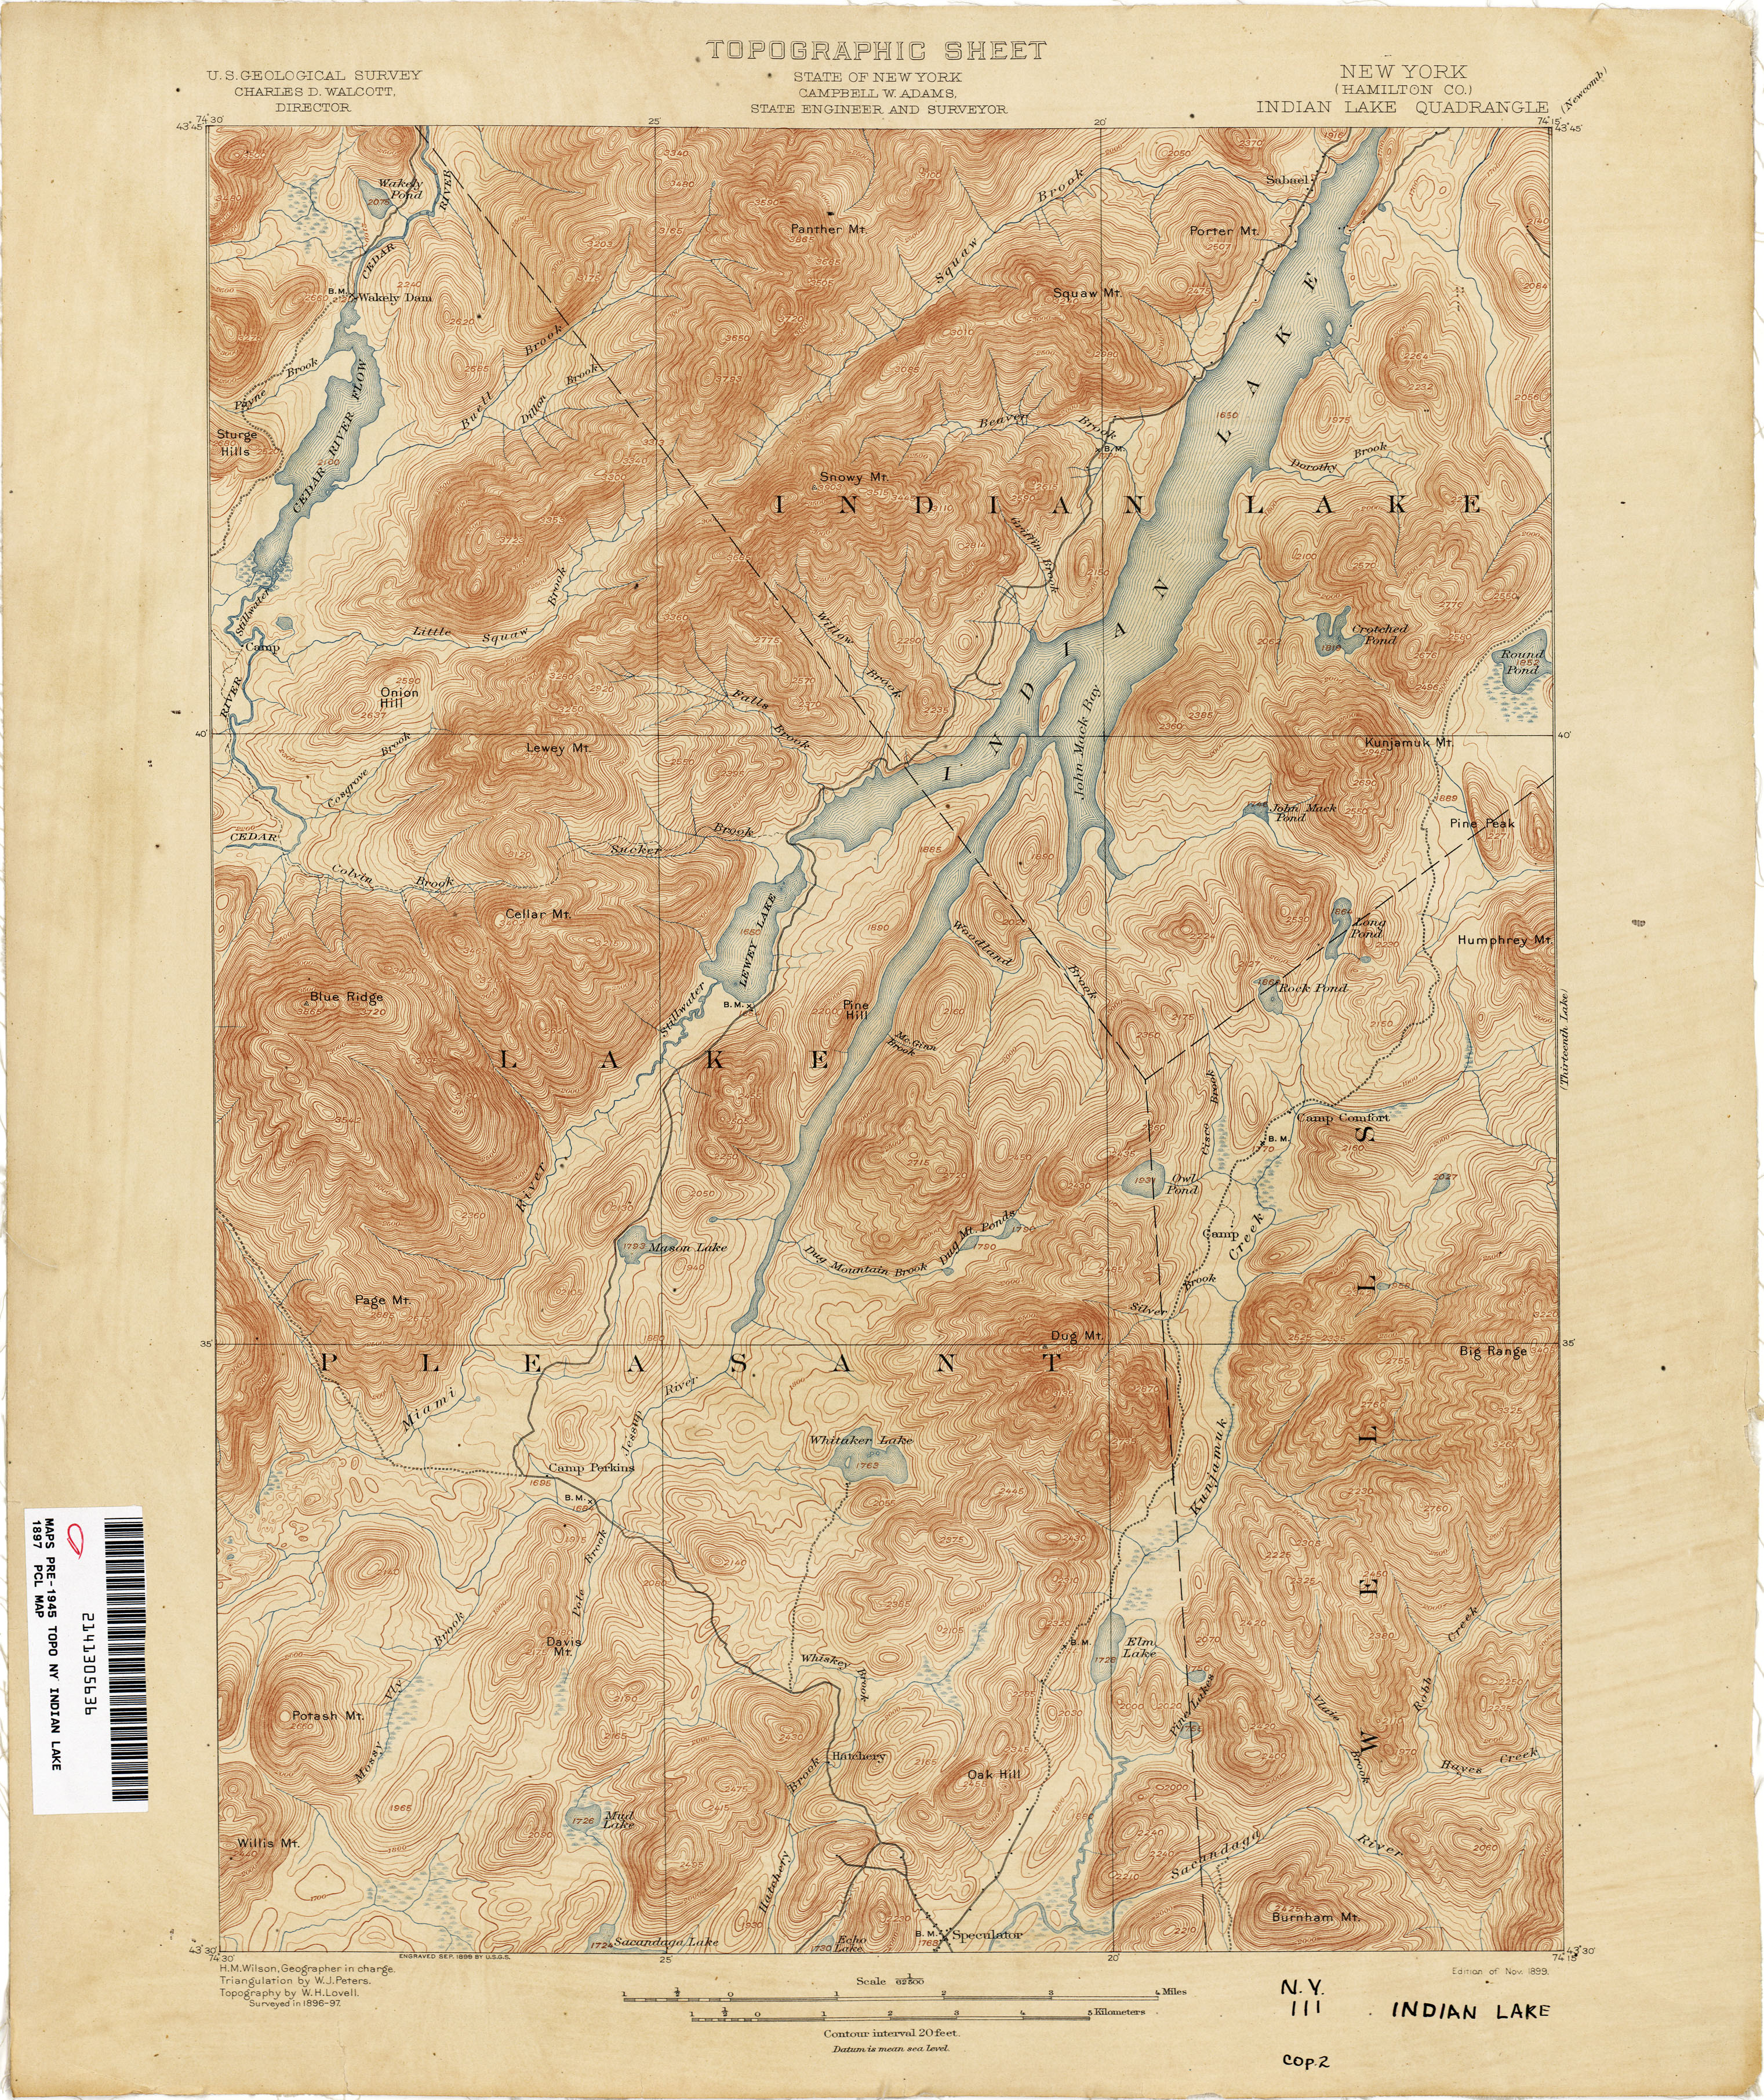 FileIndian Lake New York USGS Topo Map Jpg Wikimedia Commons - Usgs quad maps